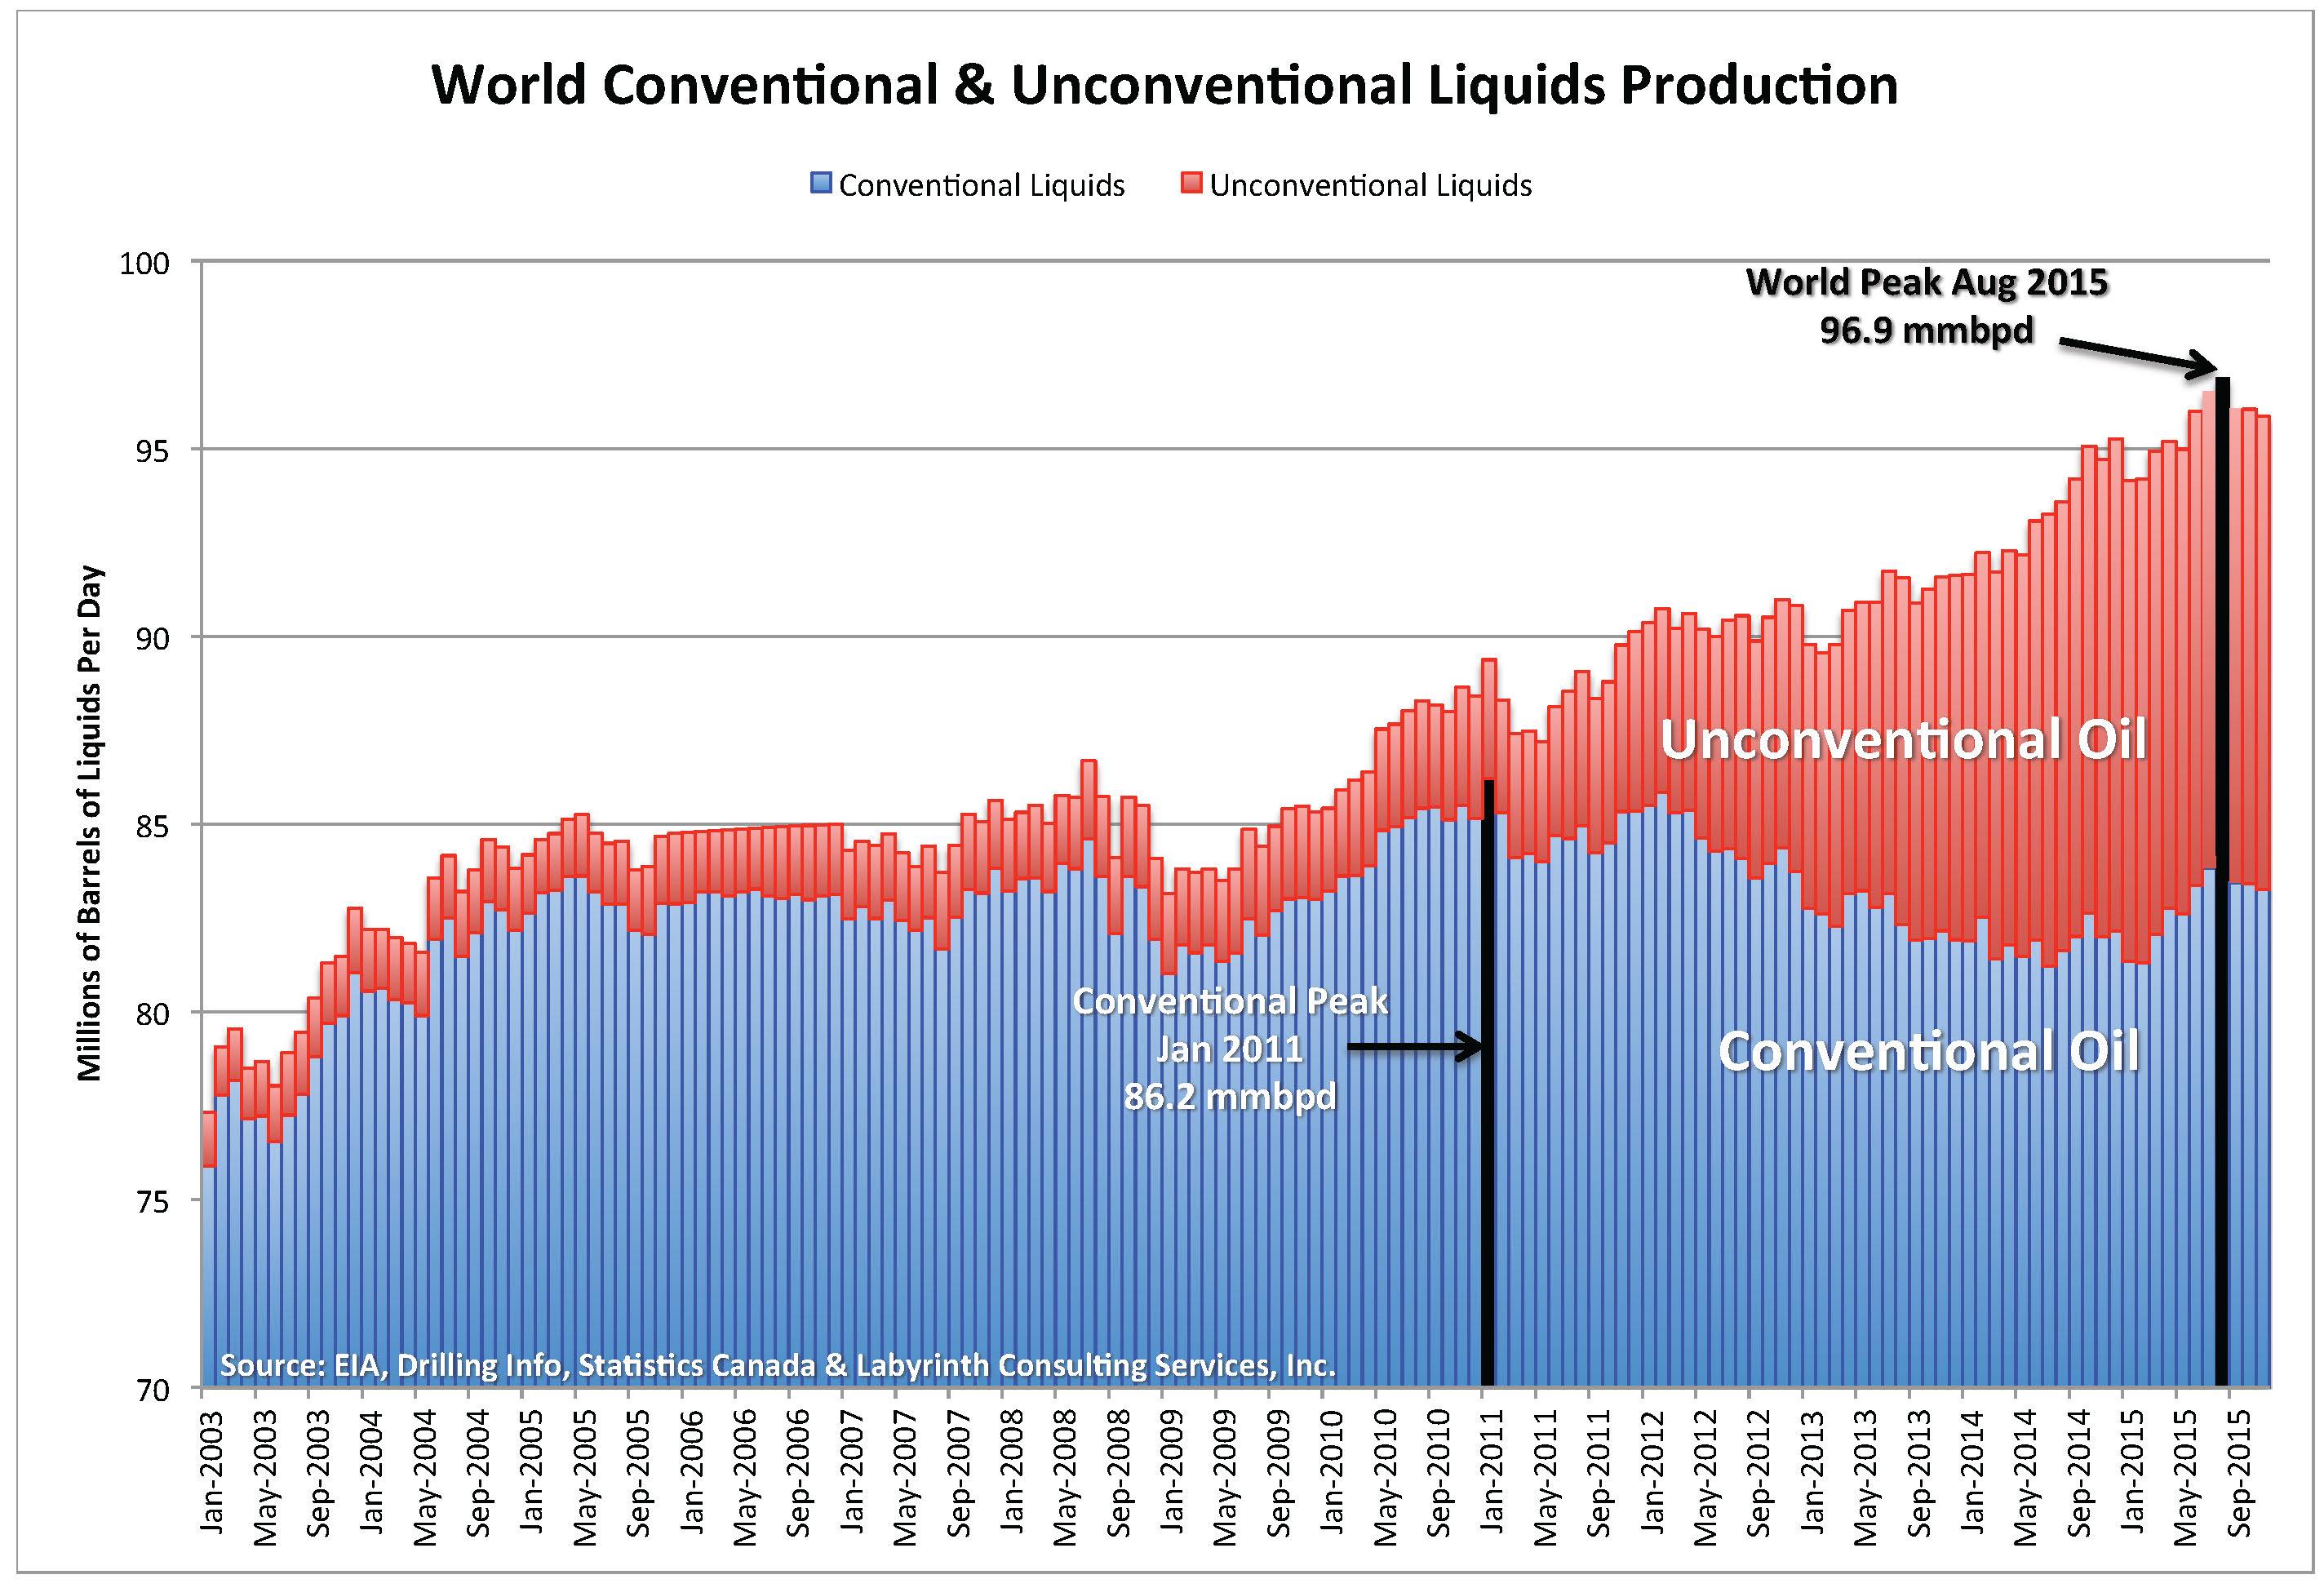 https://i1.wp.com/www.artberman.com/wp-content/uploads/Chart_World-Con-Uncon-1.jpg